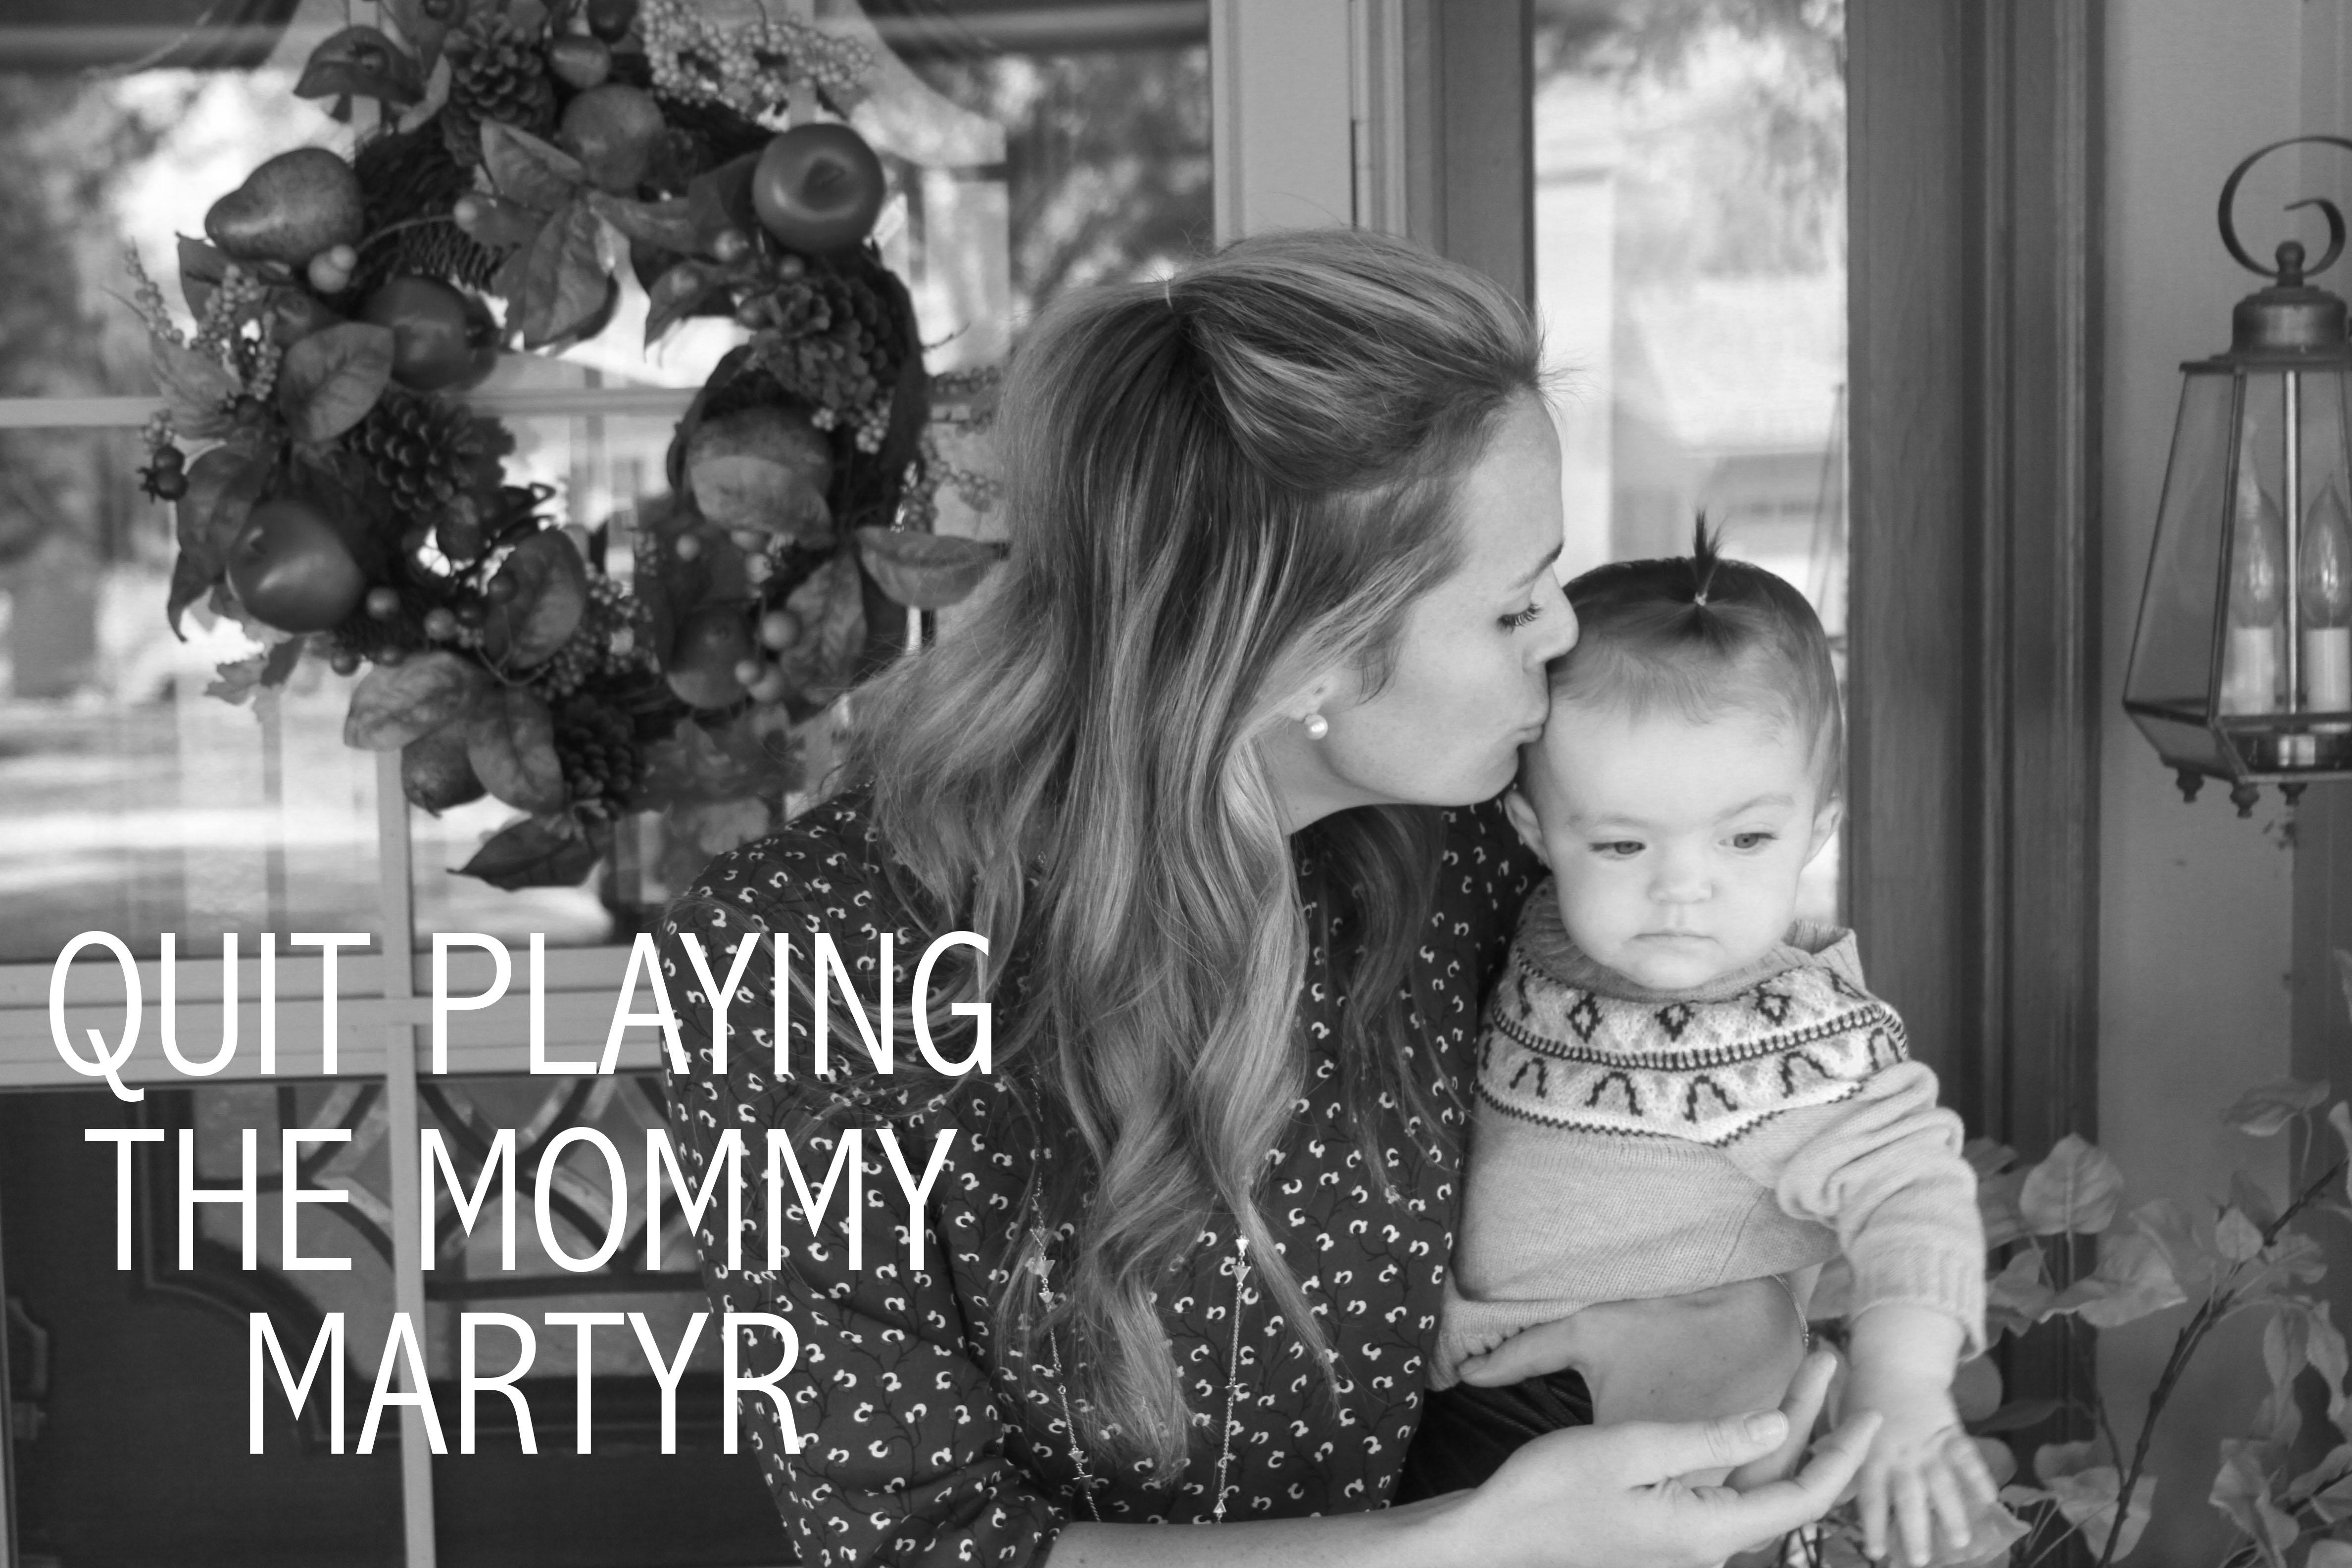 MommyMartyrPost